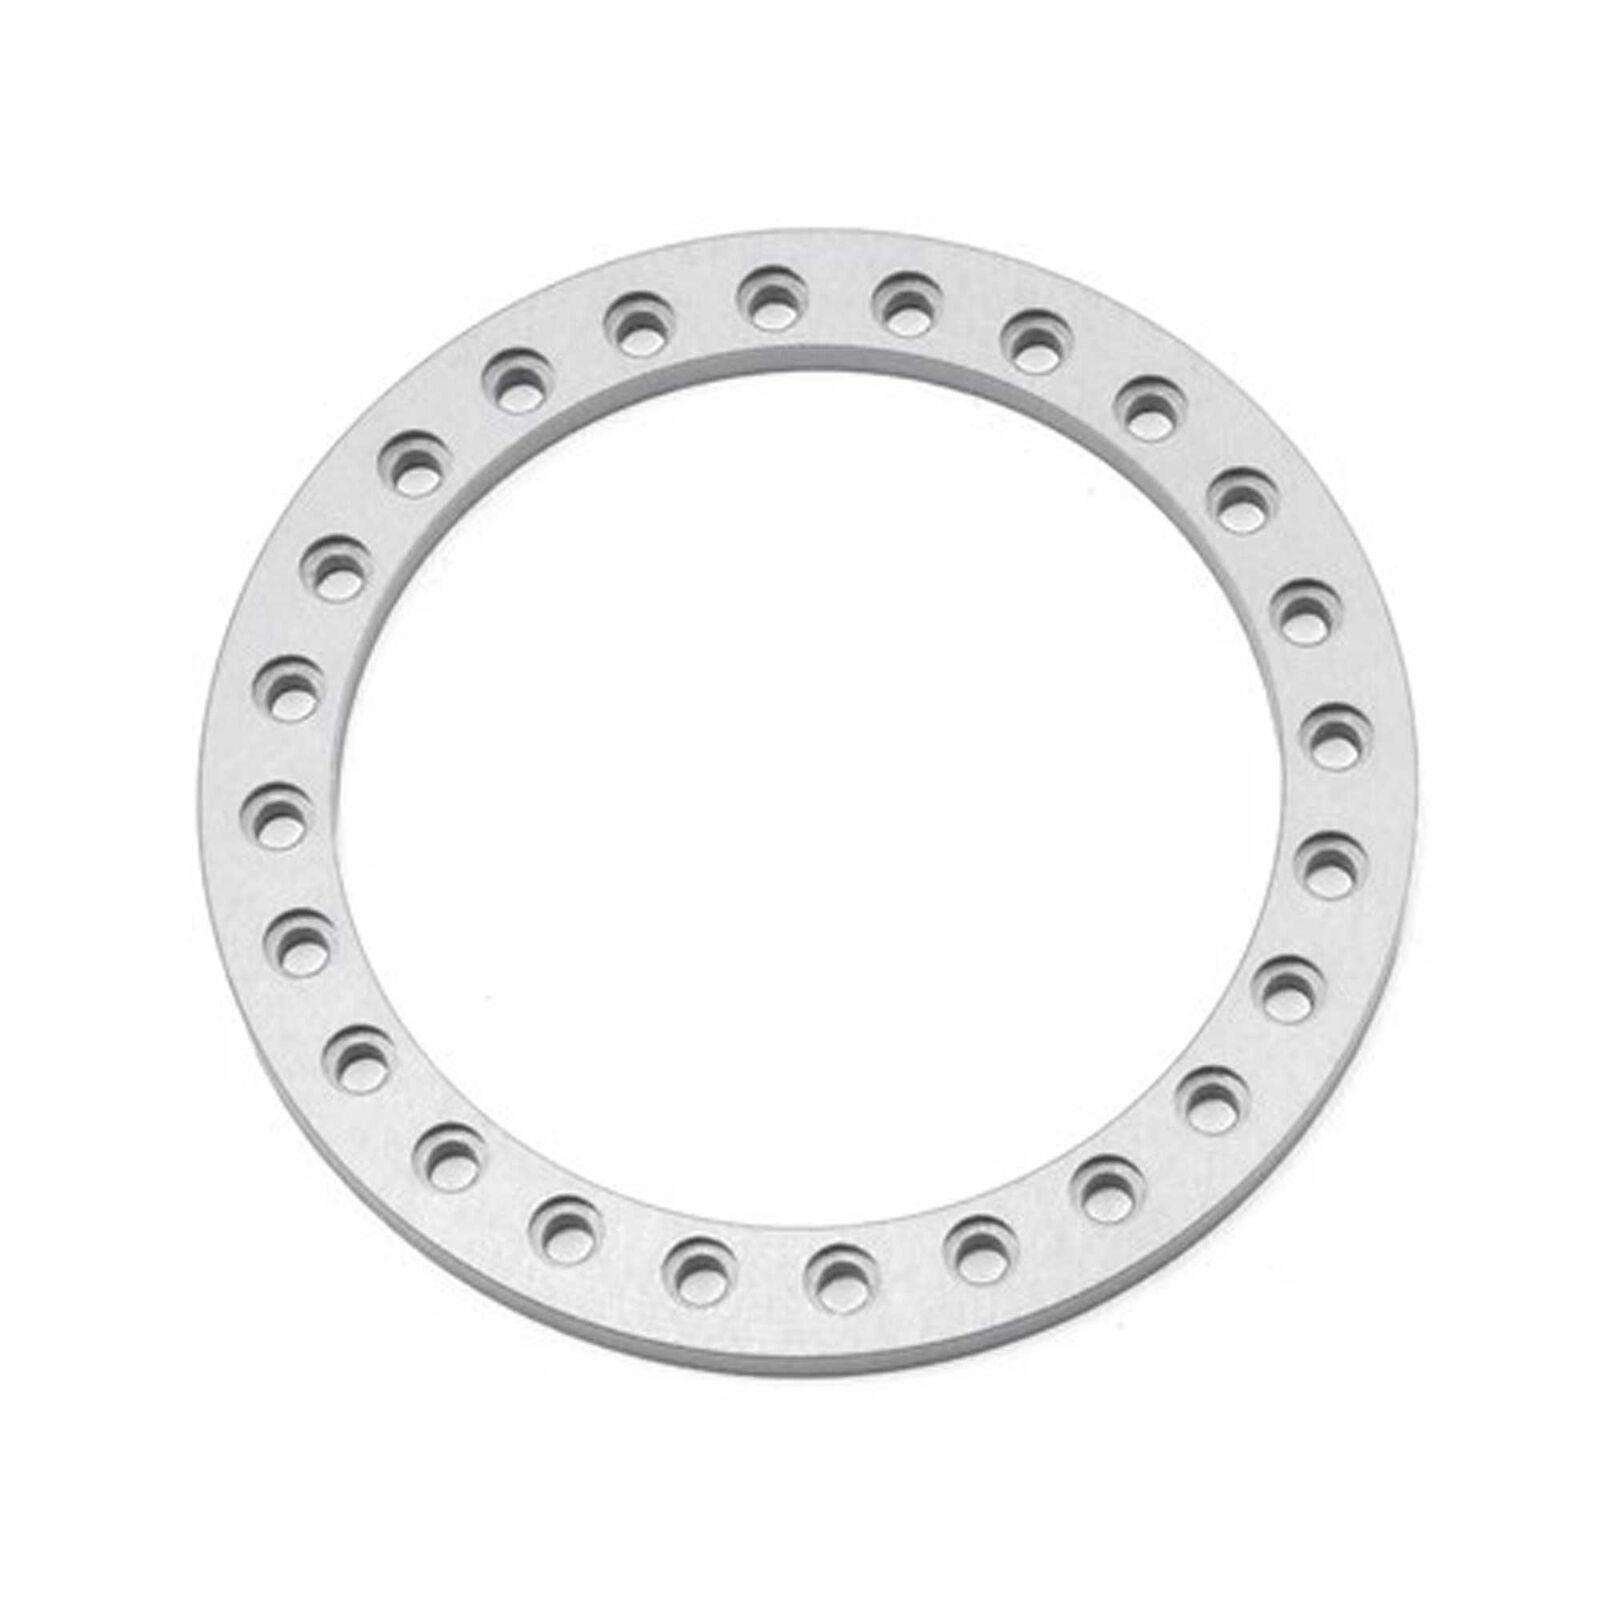 1.9 Original Beadlock, Clear Anodized